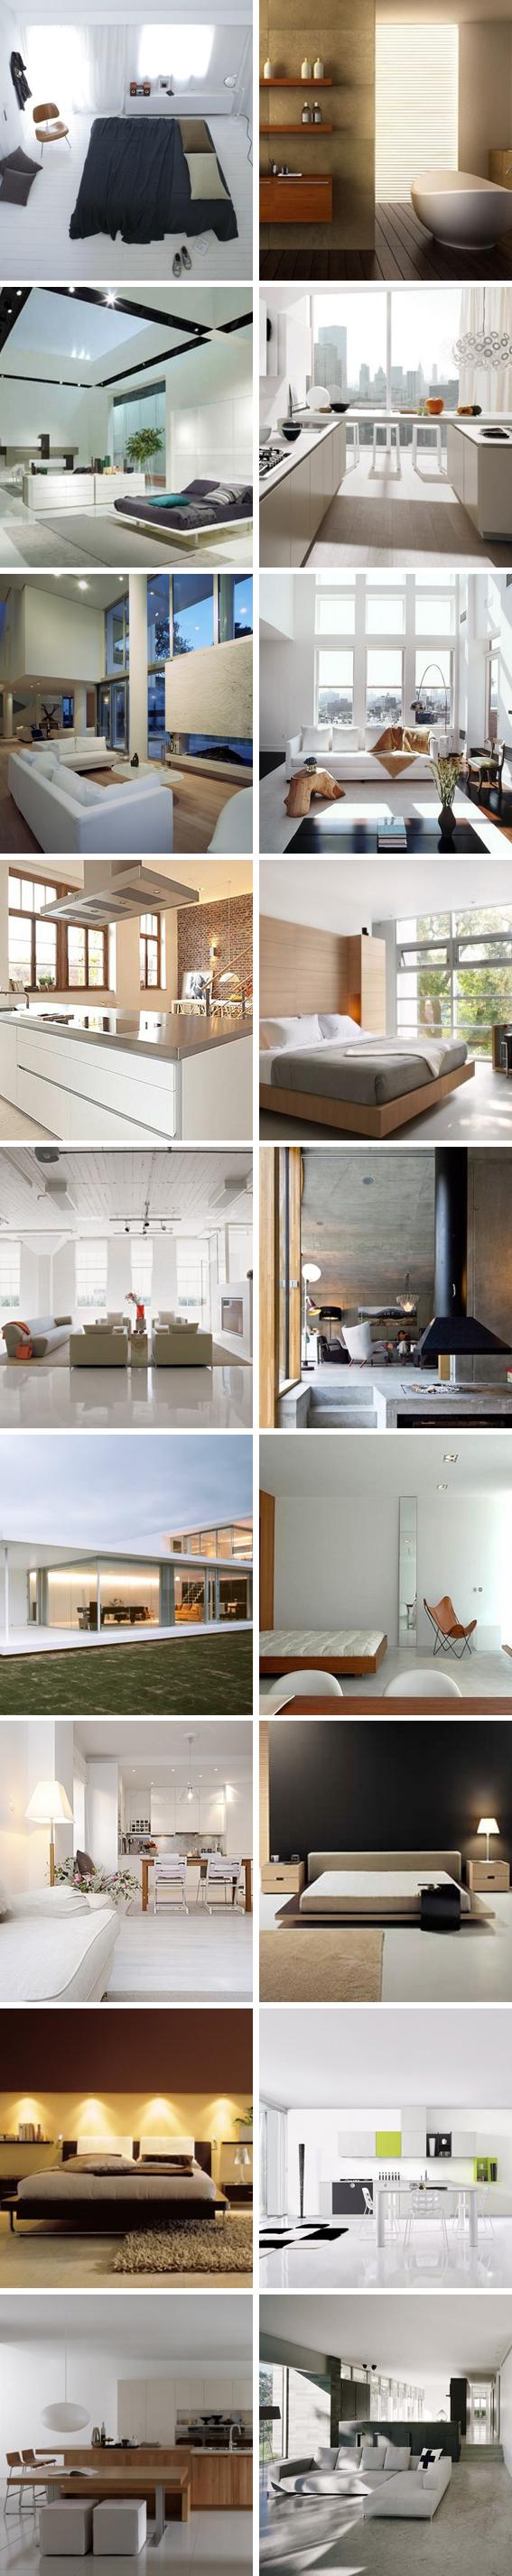 decoracao-minimalista-lola